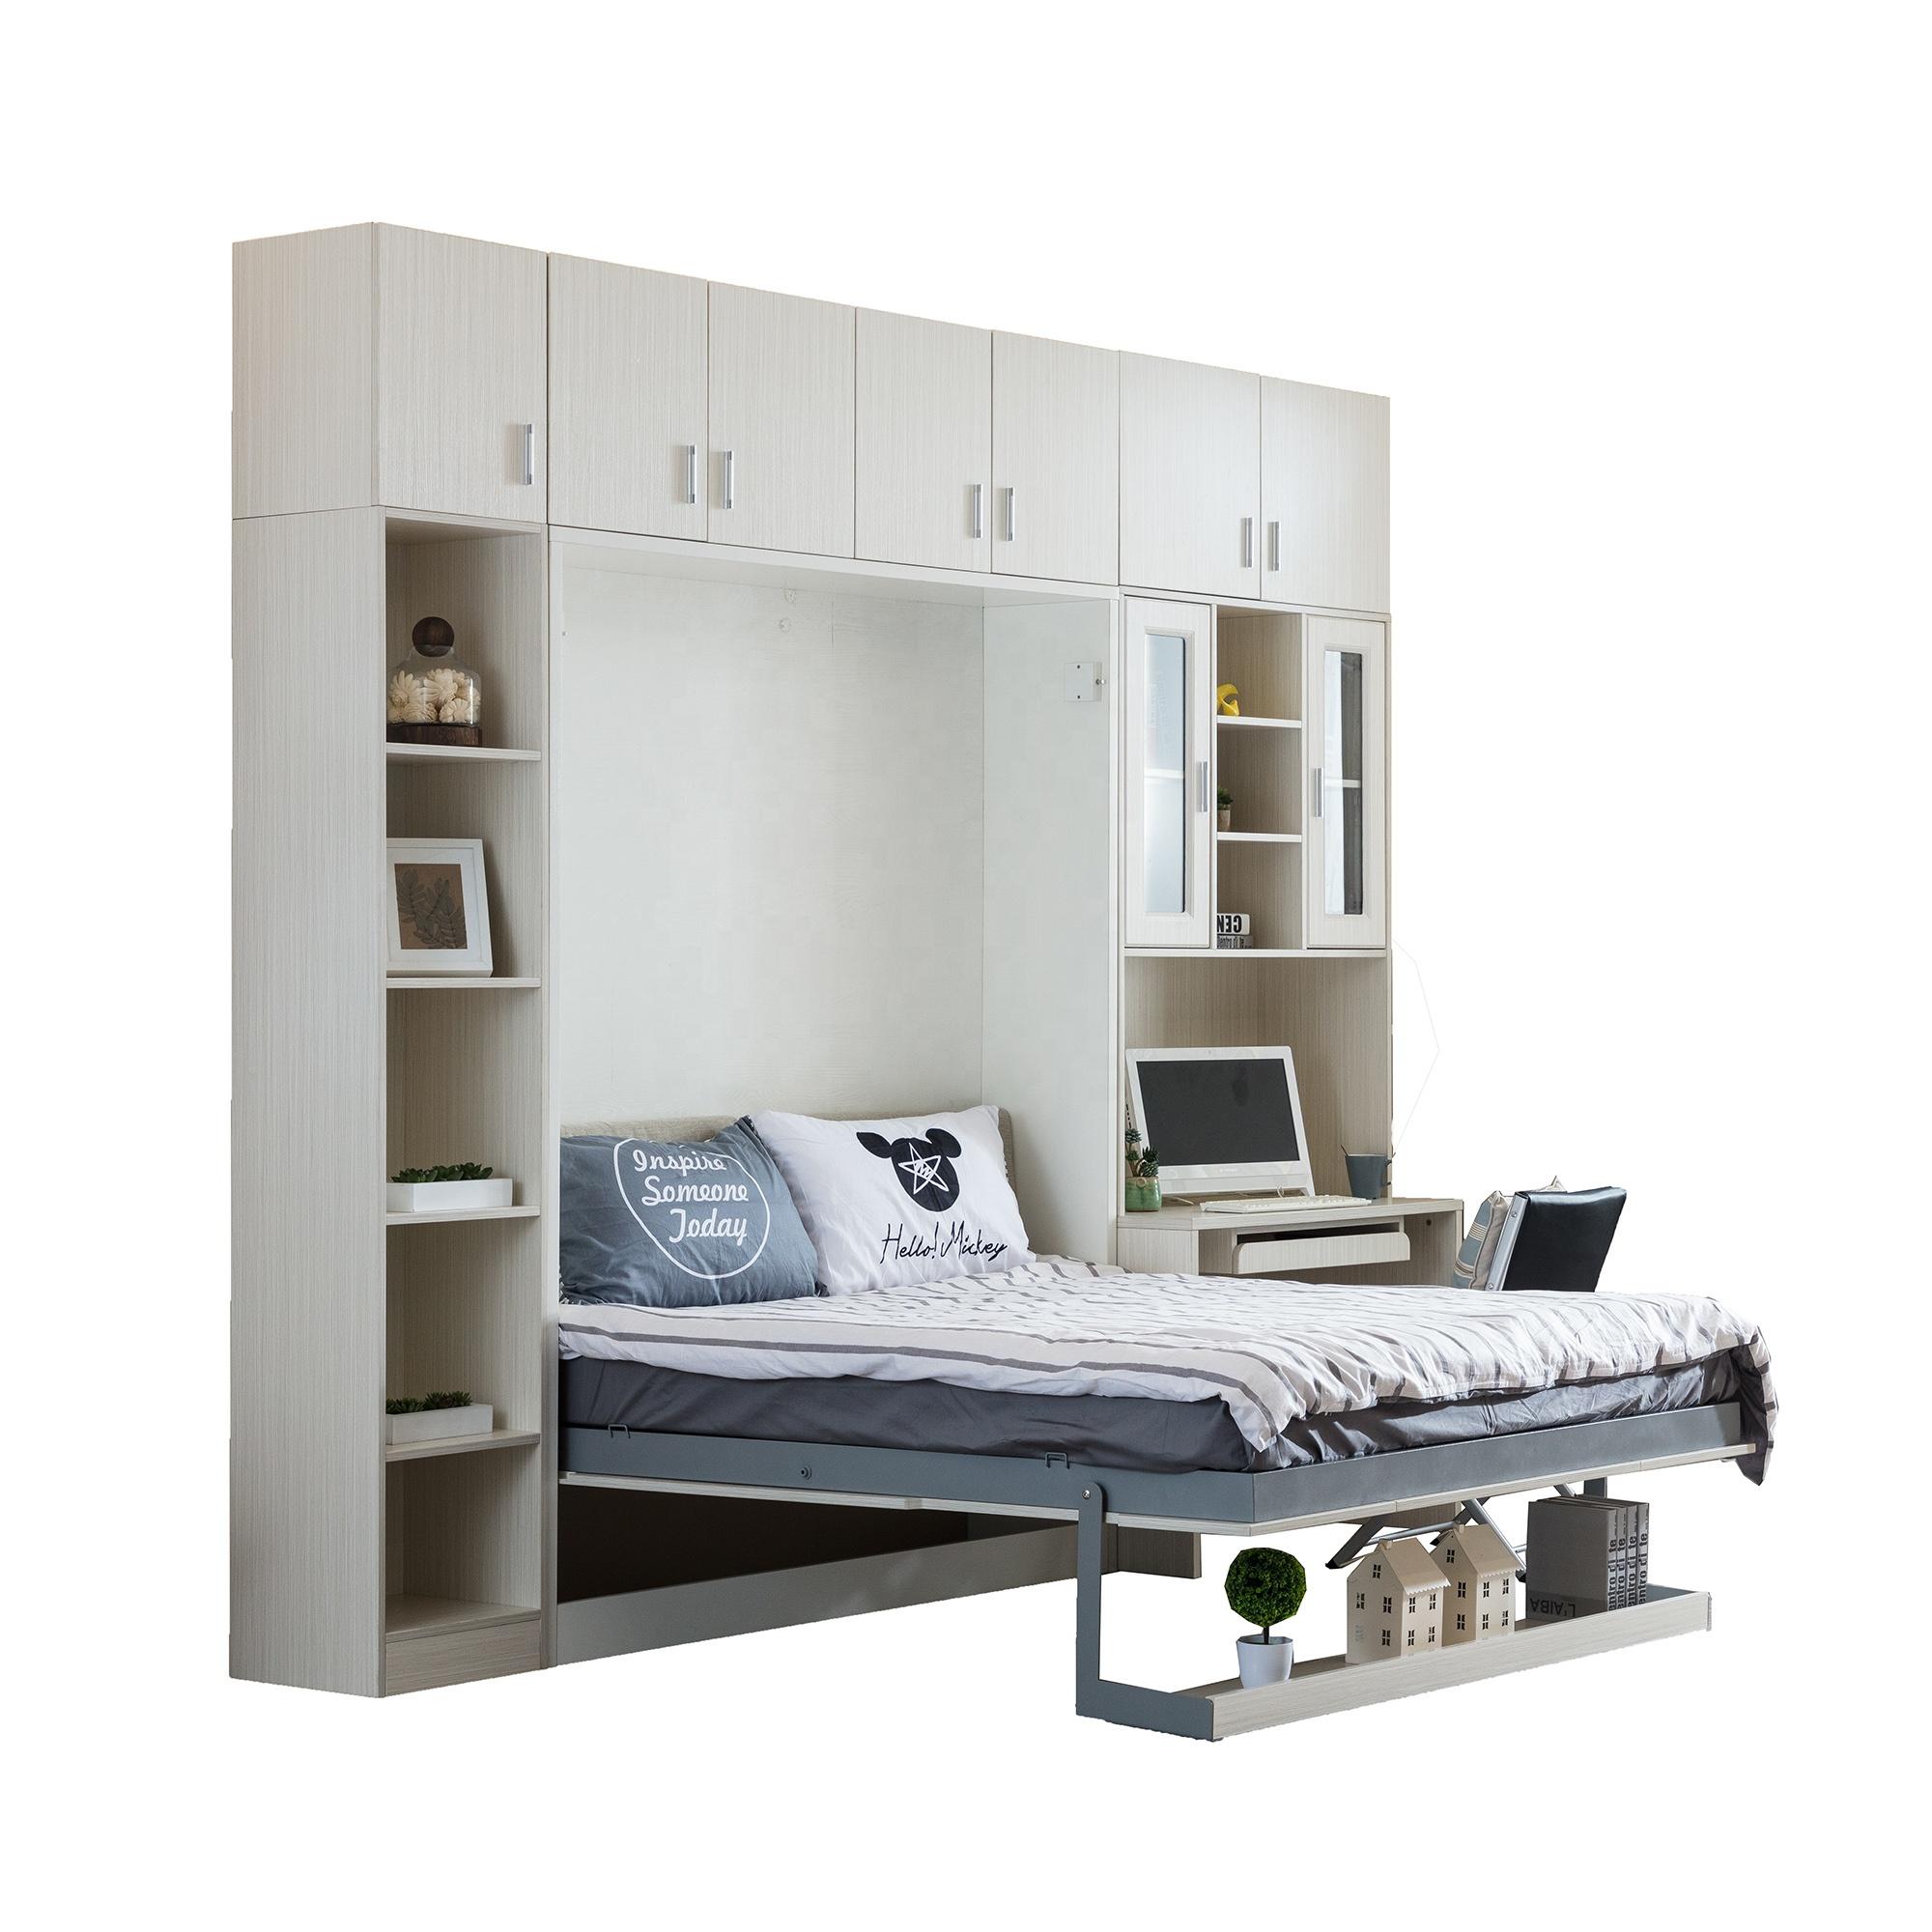 Hot Sale Space Saving Wall Mount Furniture Set Folding Murphy Beds Wall Beds Mechanism Buy Wall Bed Mechanism Murphy Bed Folding Wall Bed Product On Alibaba Com